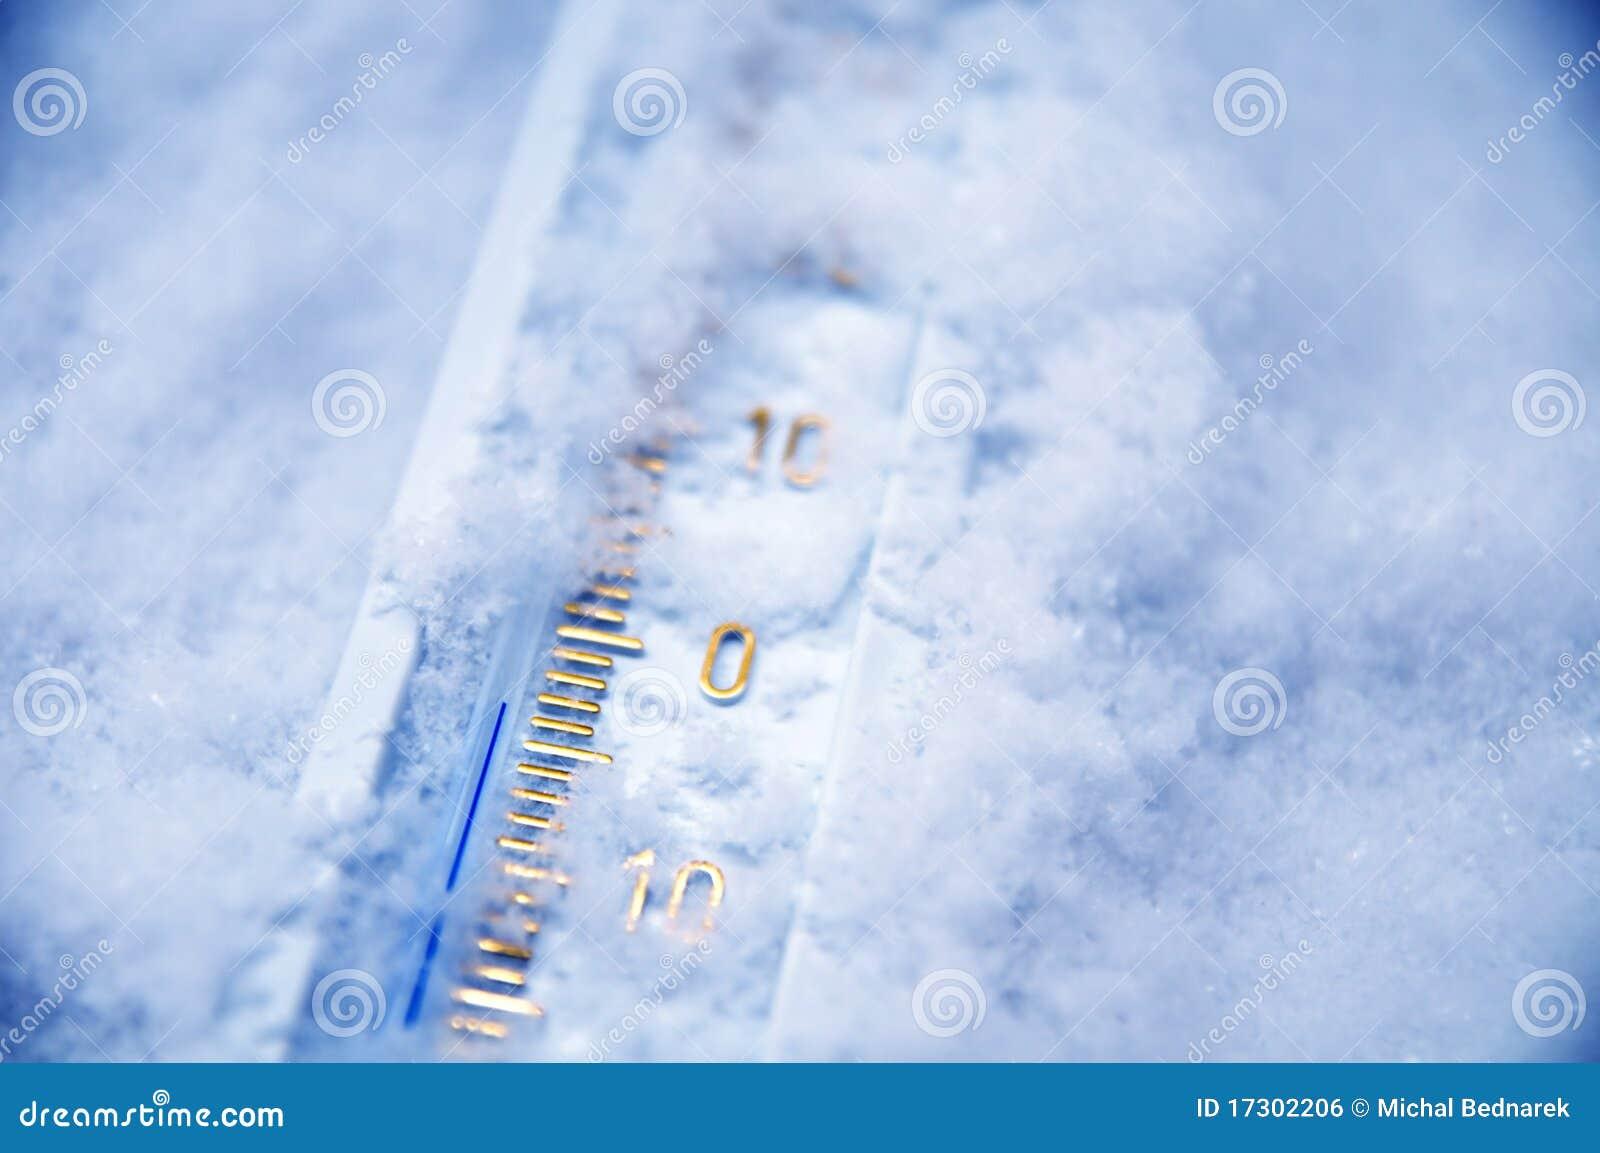 Below zero on thermometer